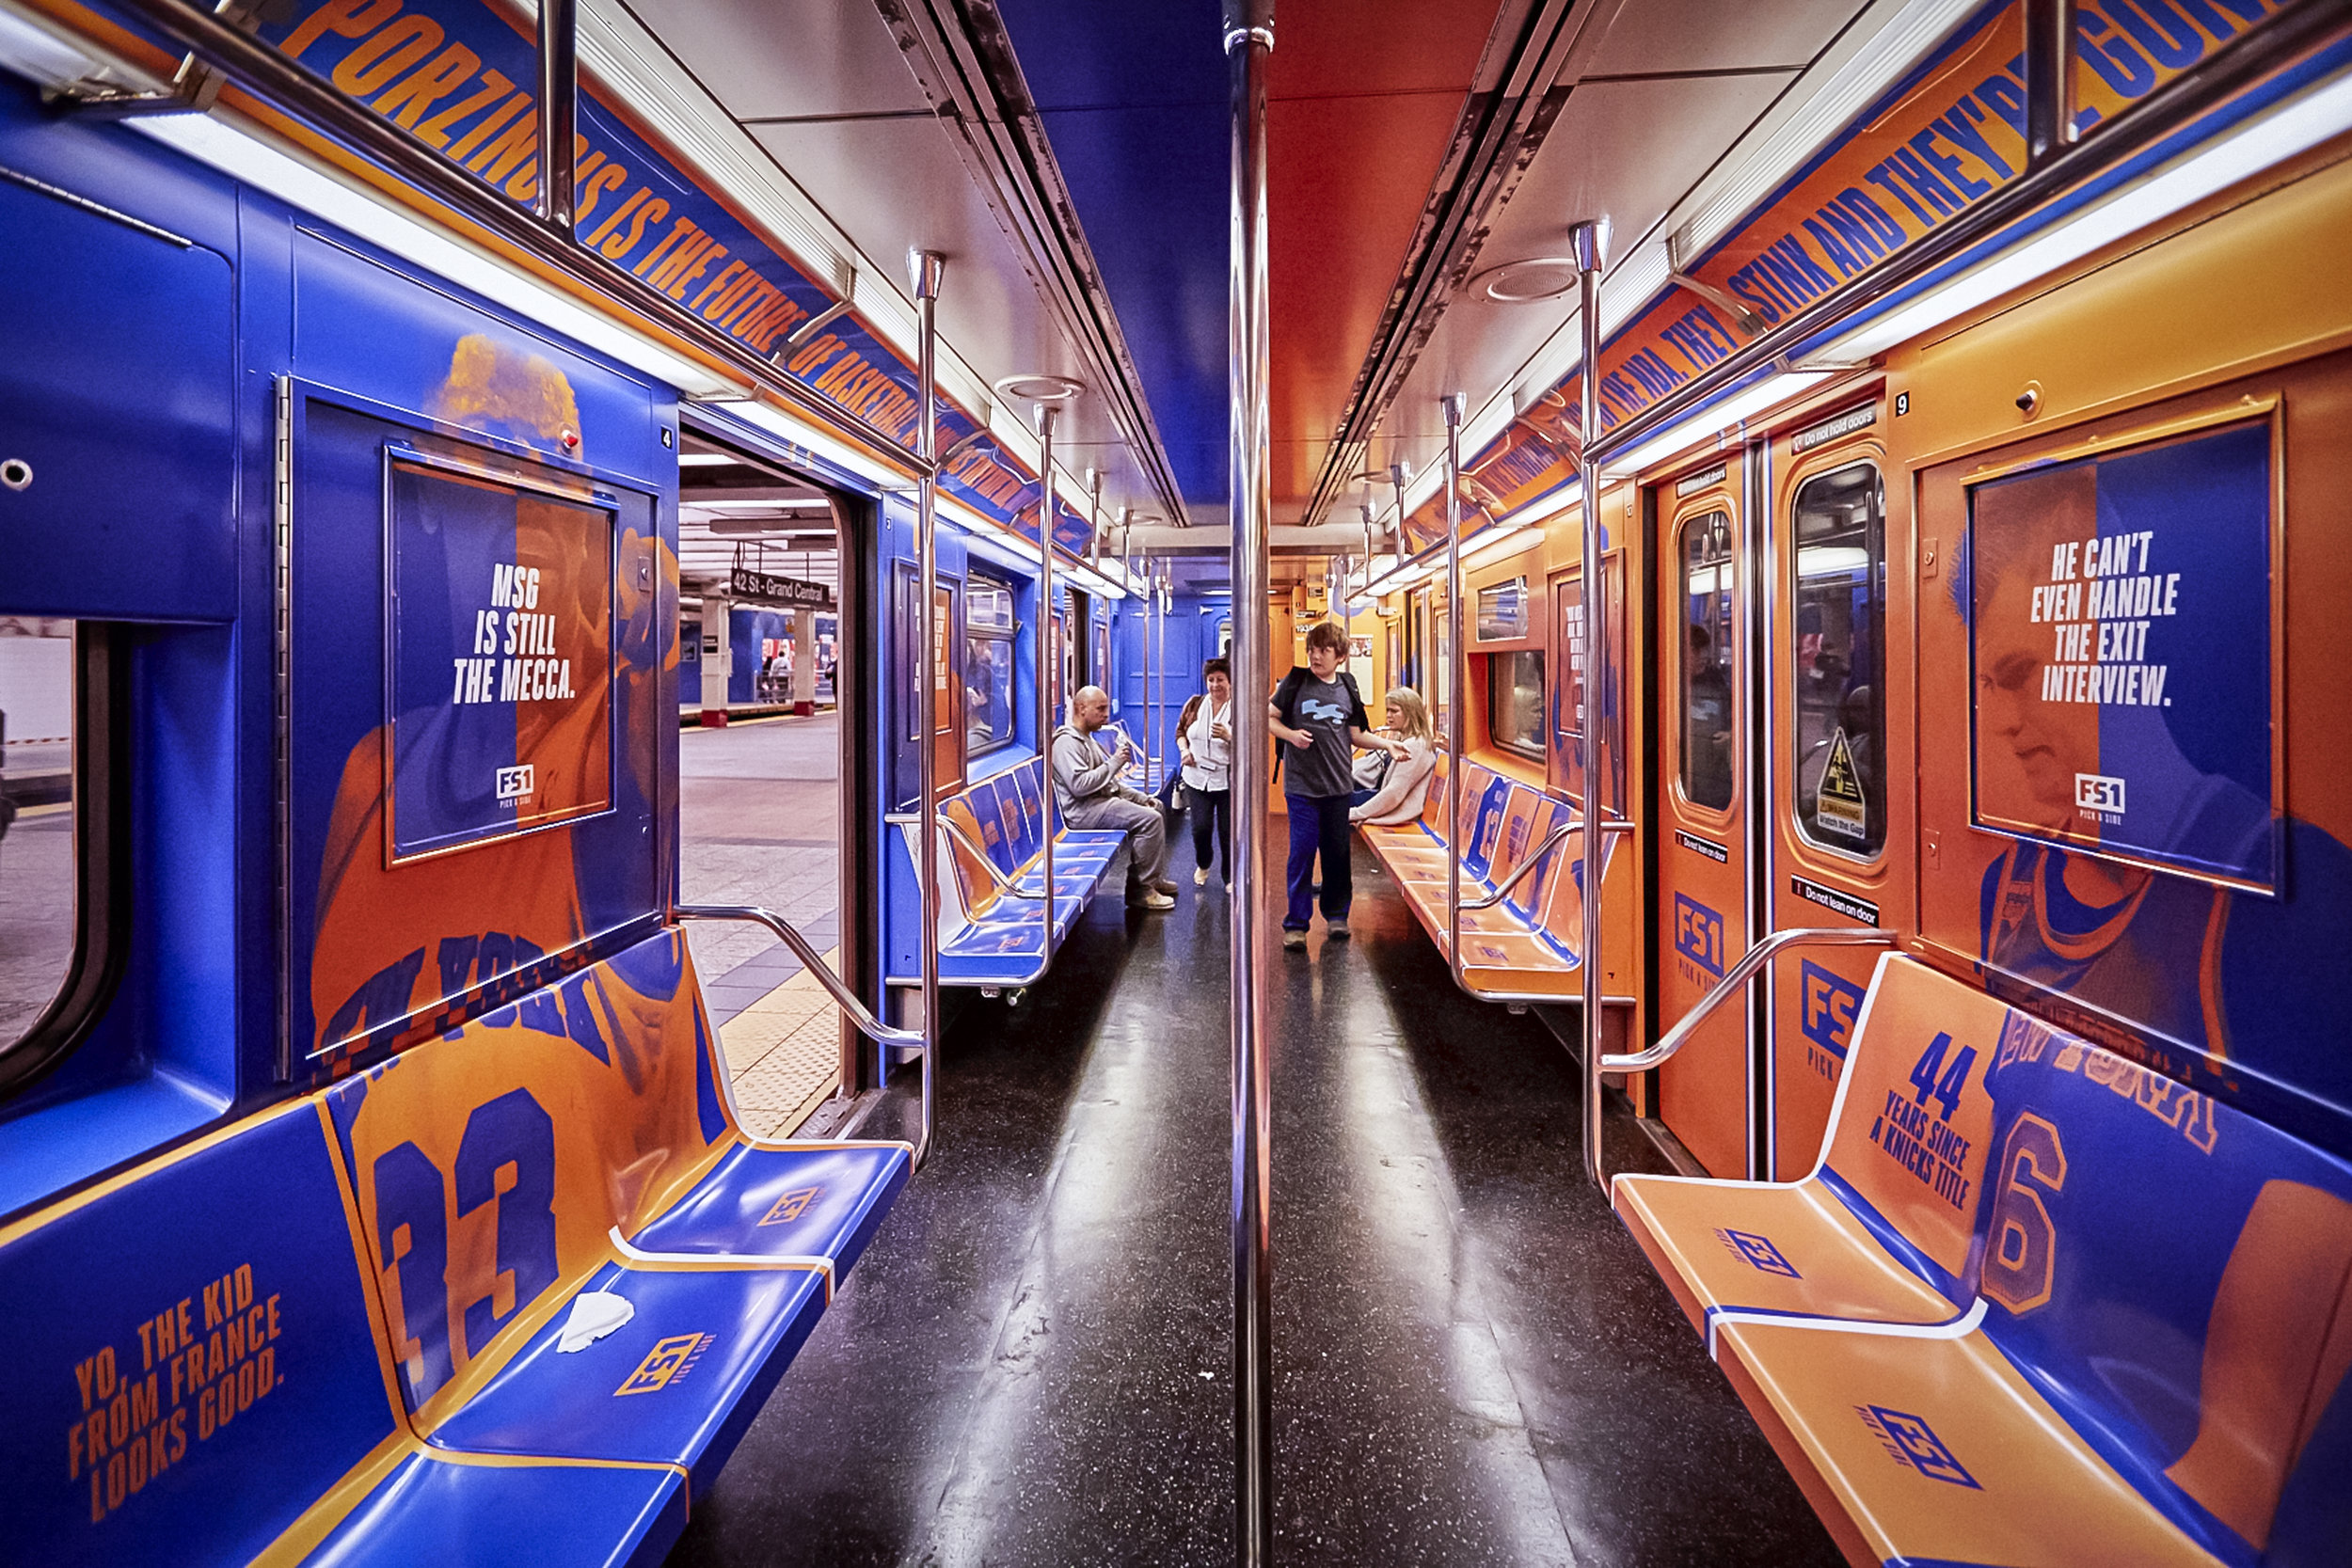 FS1_subway_shots_03.jpg